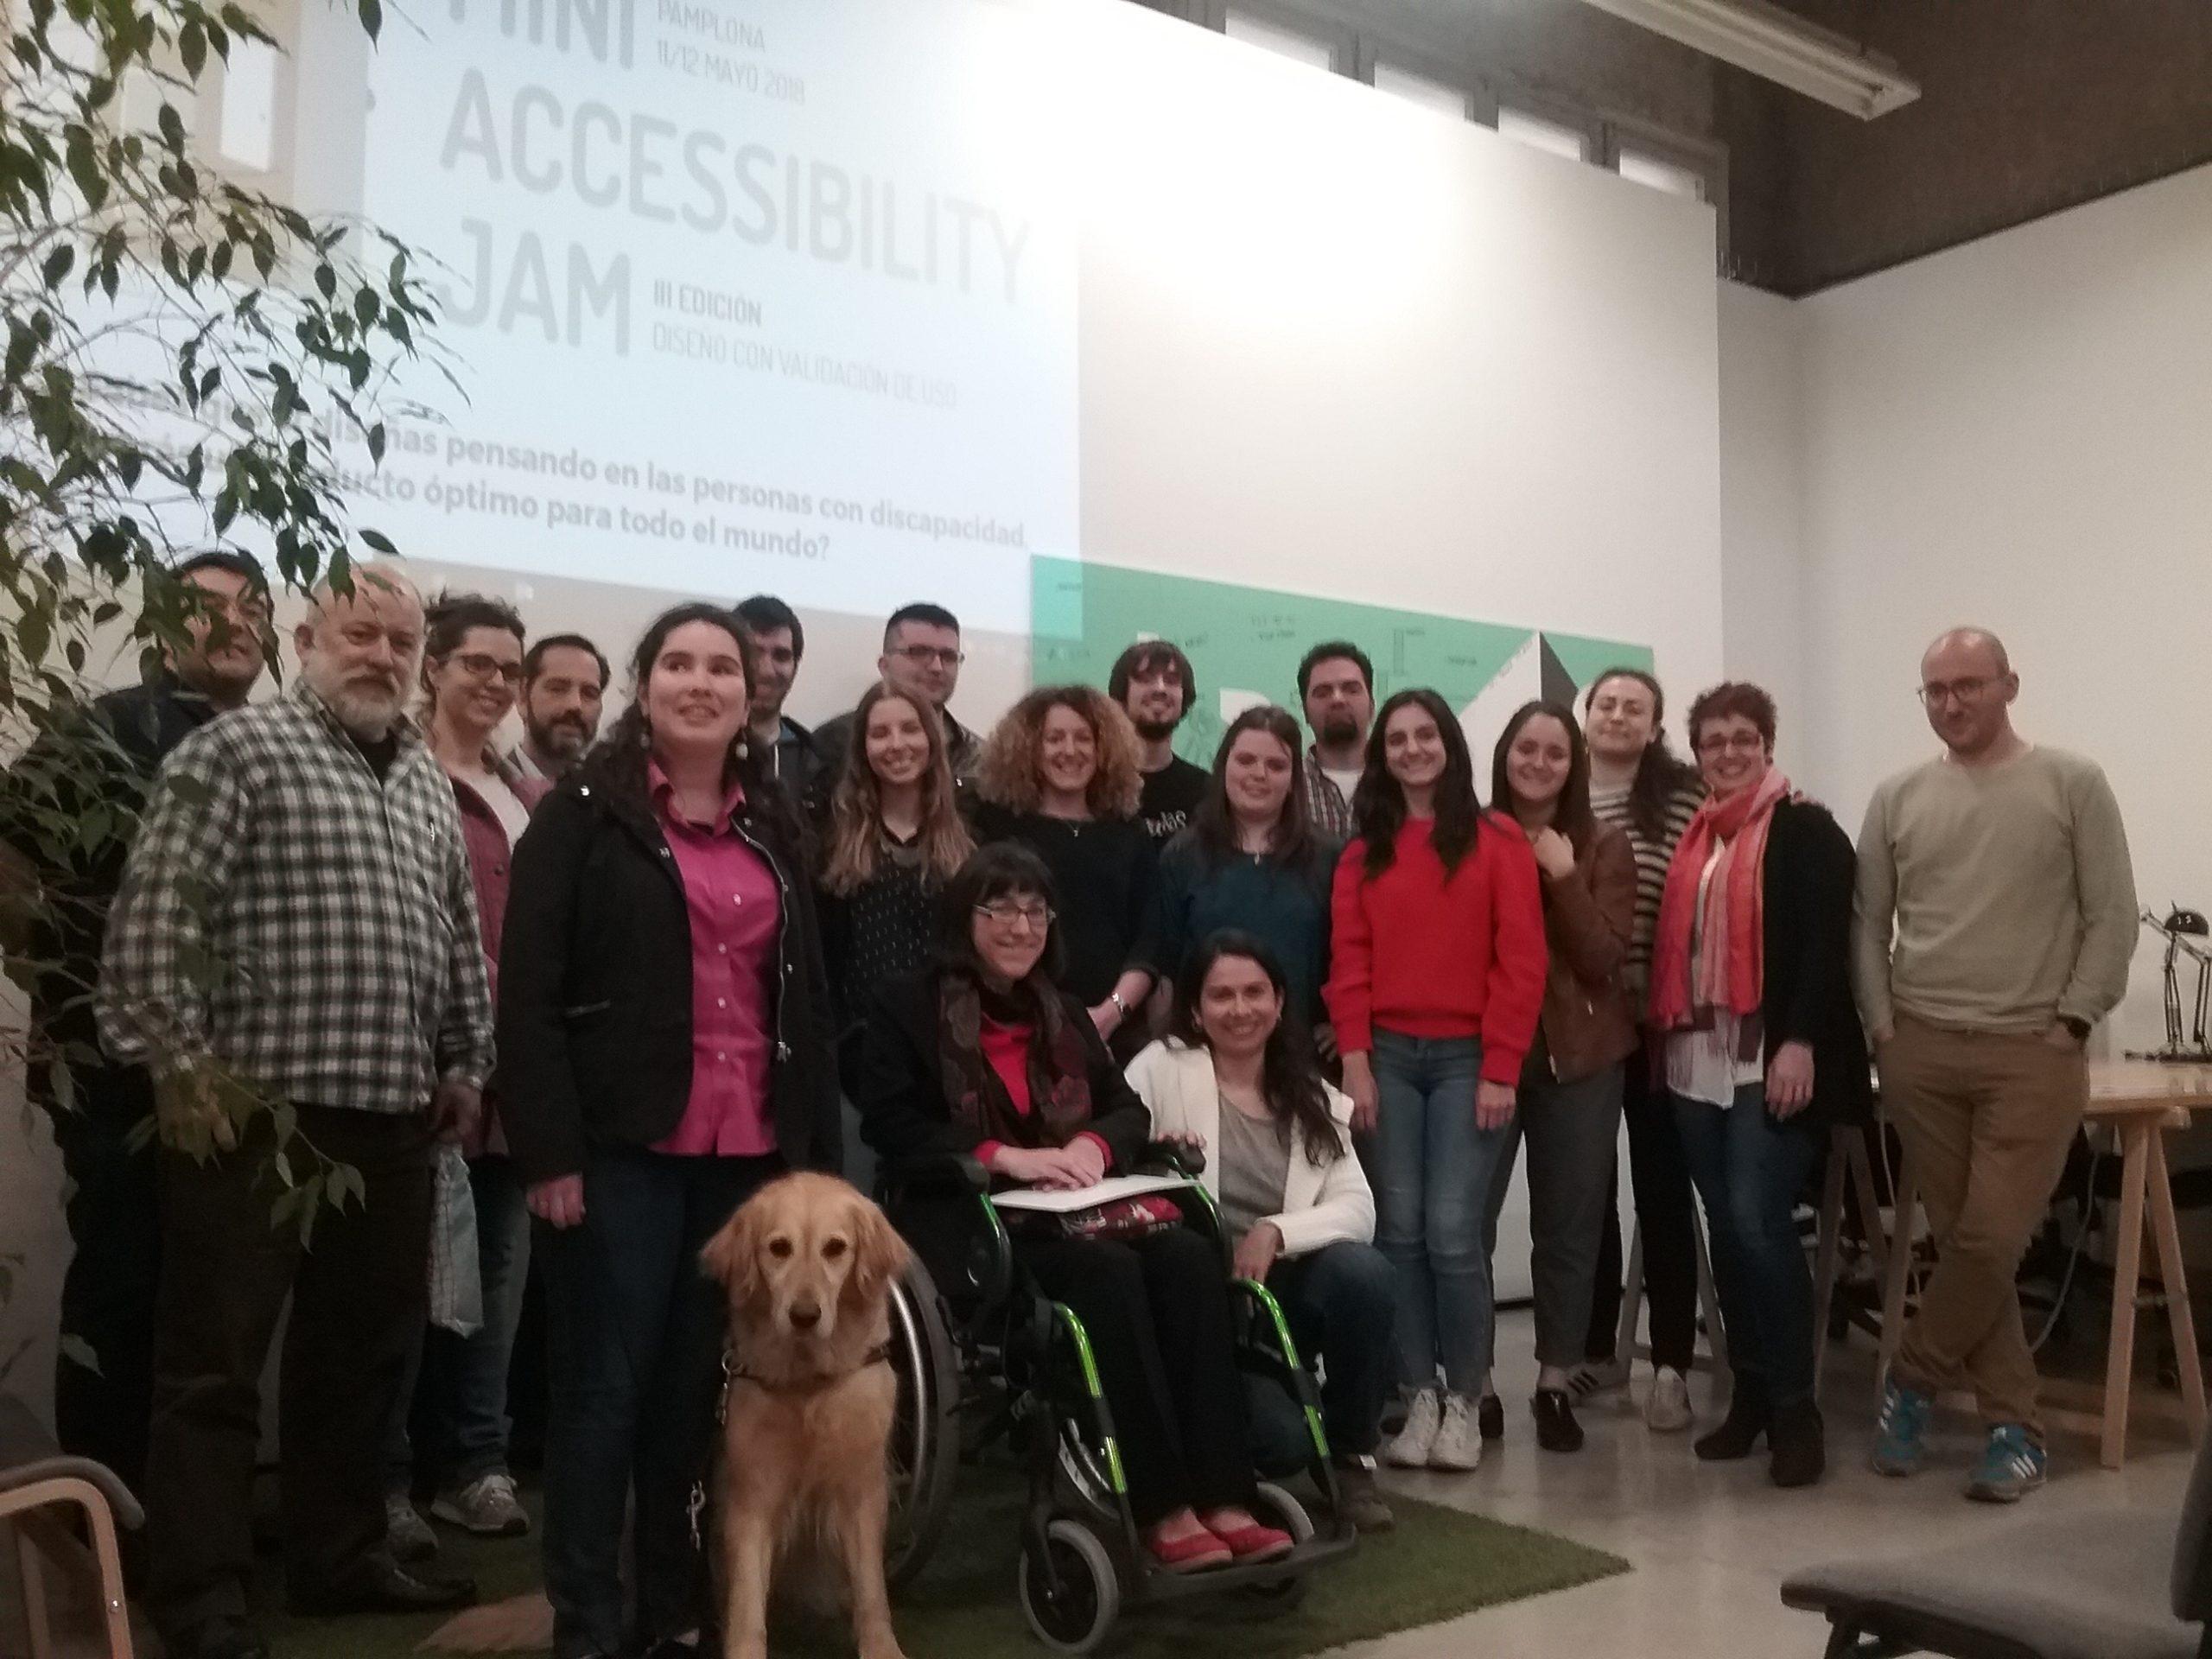 Esto va de perros…III Mini Accessibility Jam